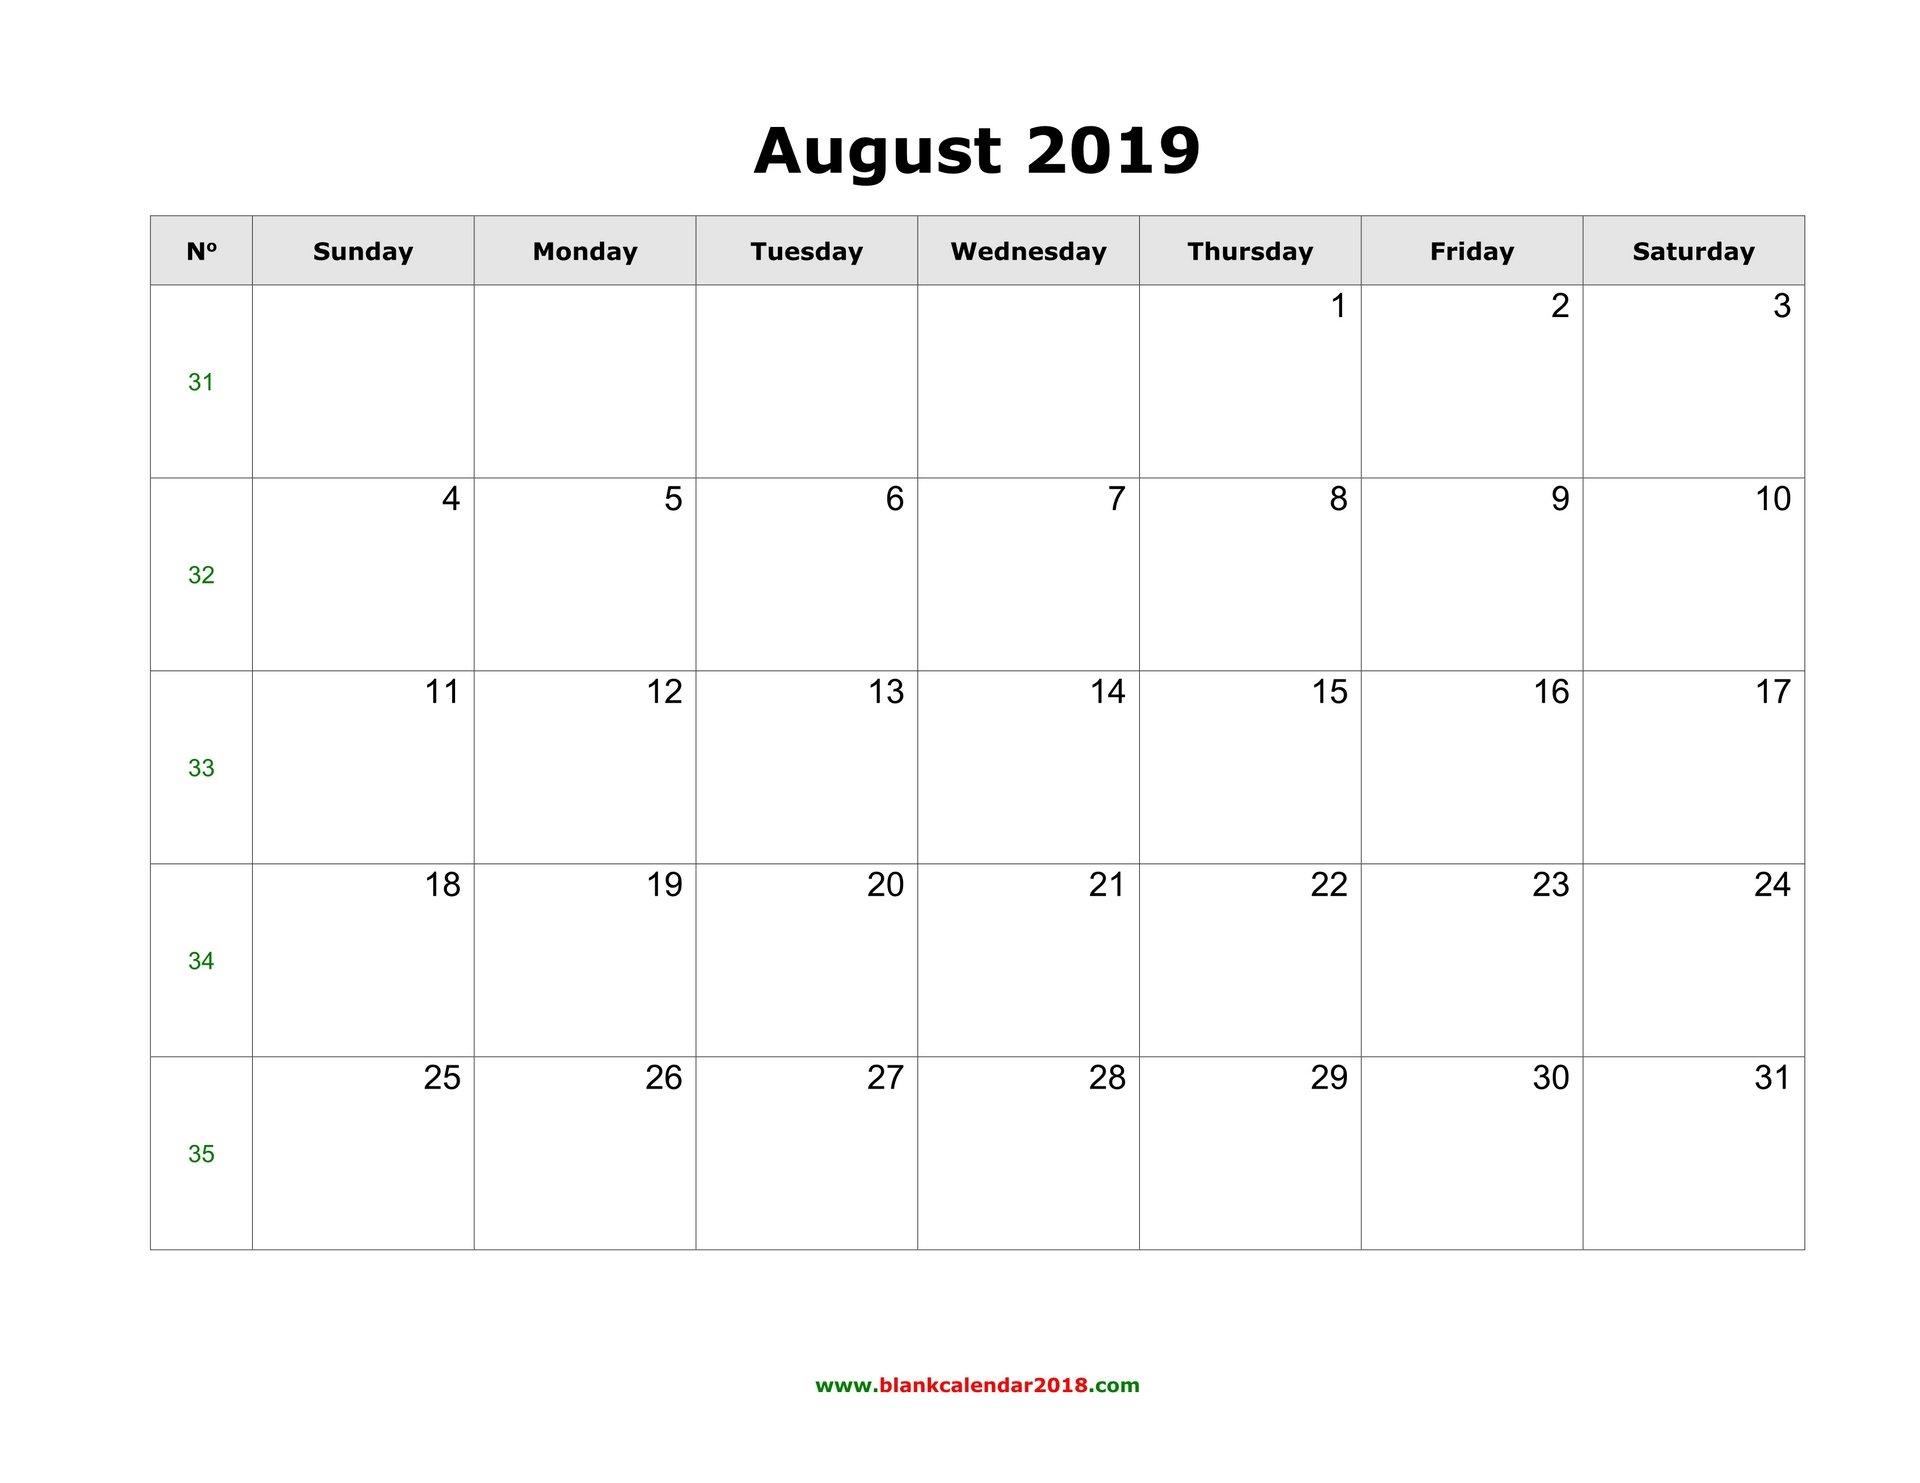 Blank Calendar For August 2019 Monday Through Sunday Calendar Word